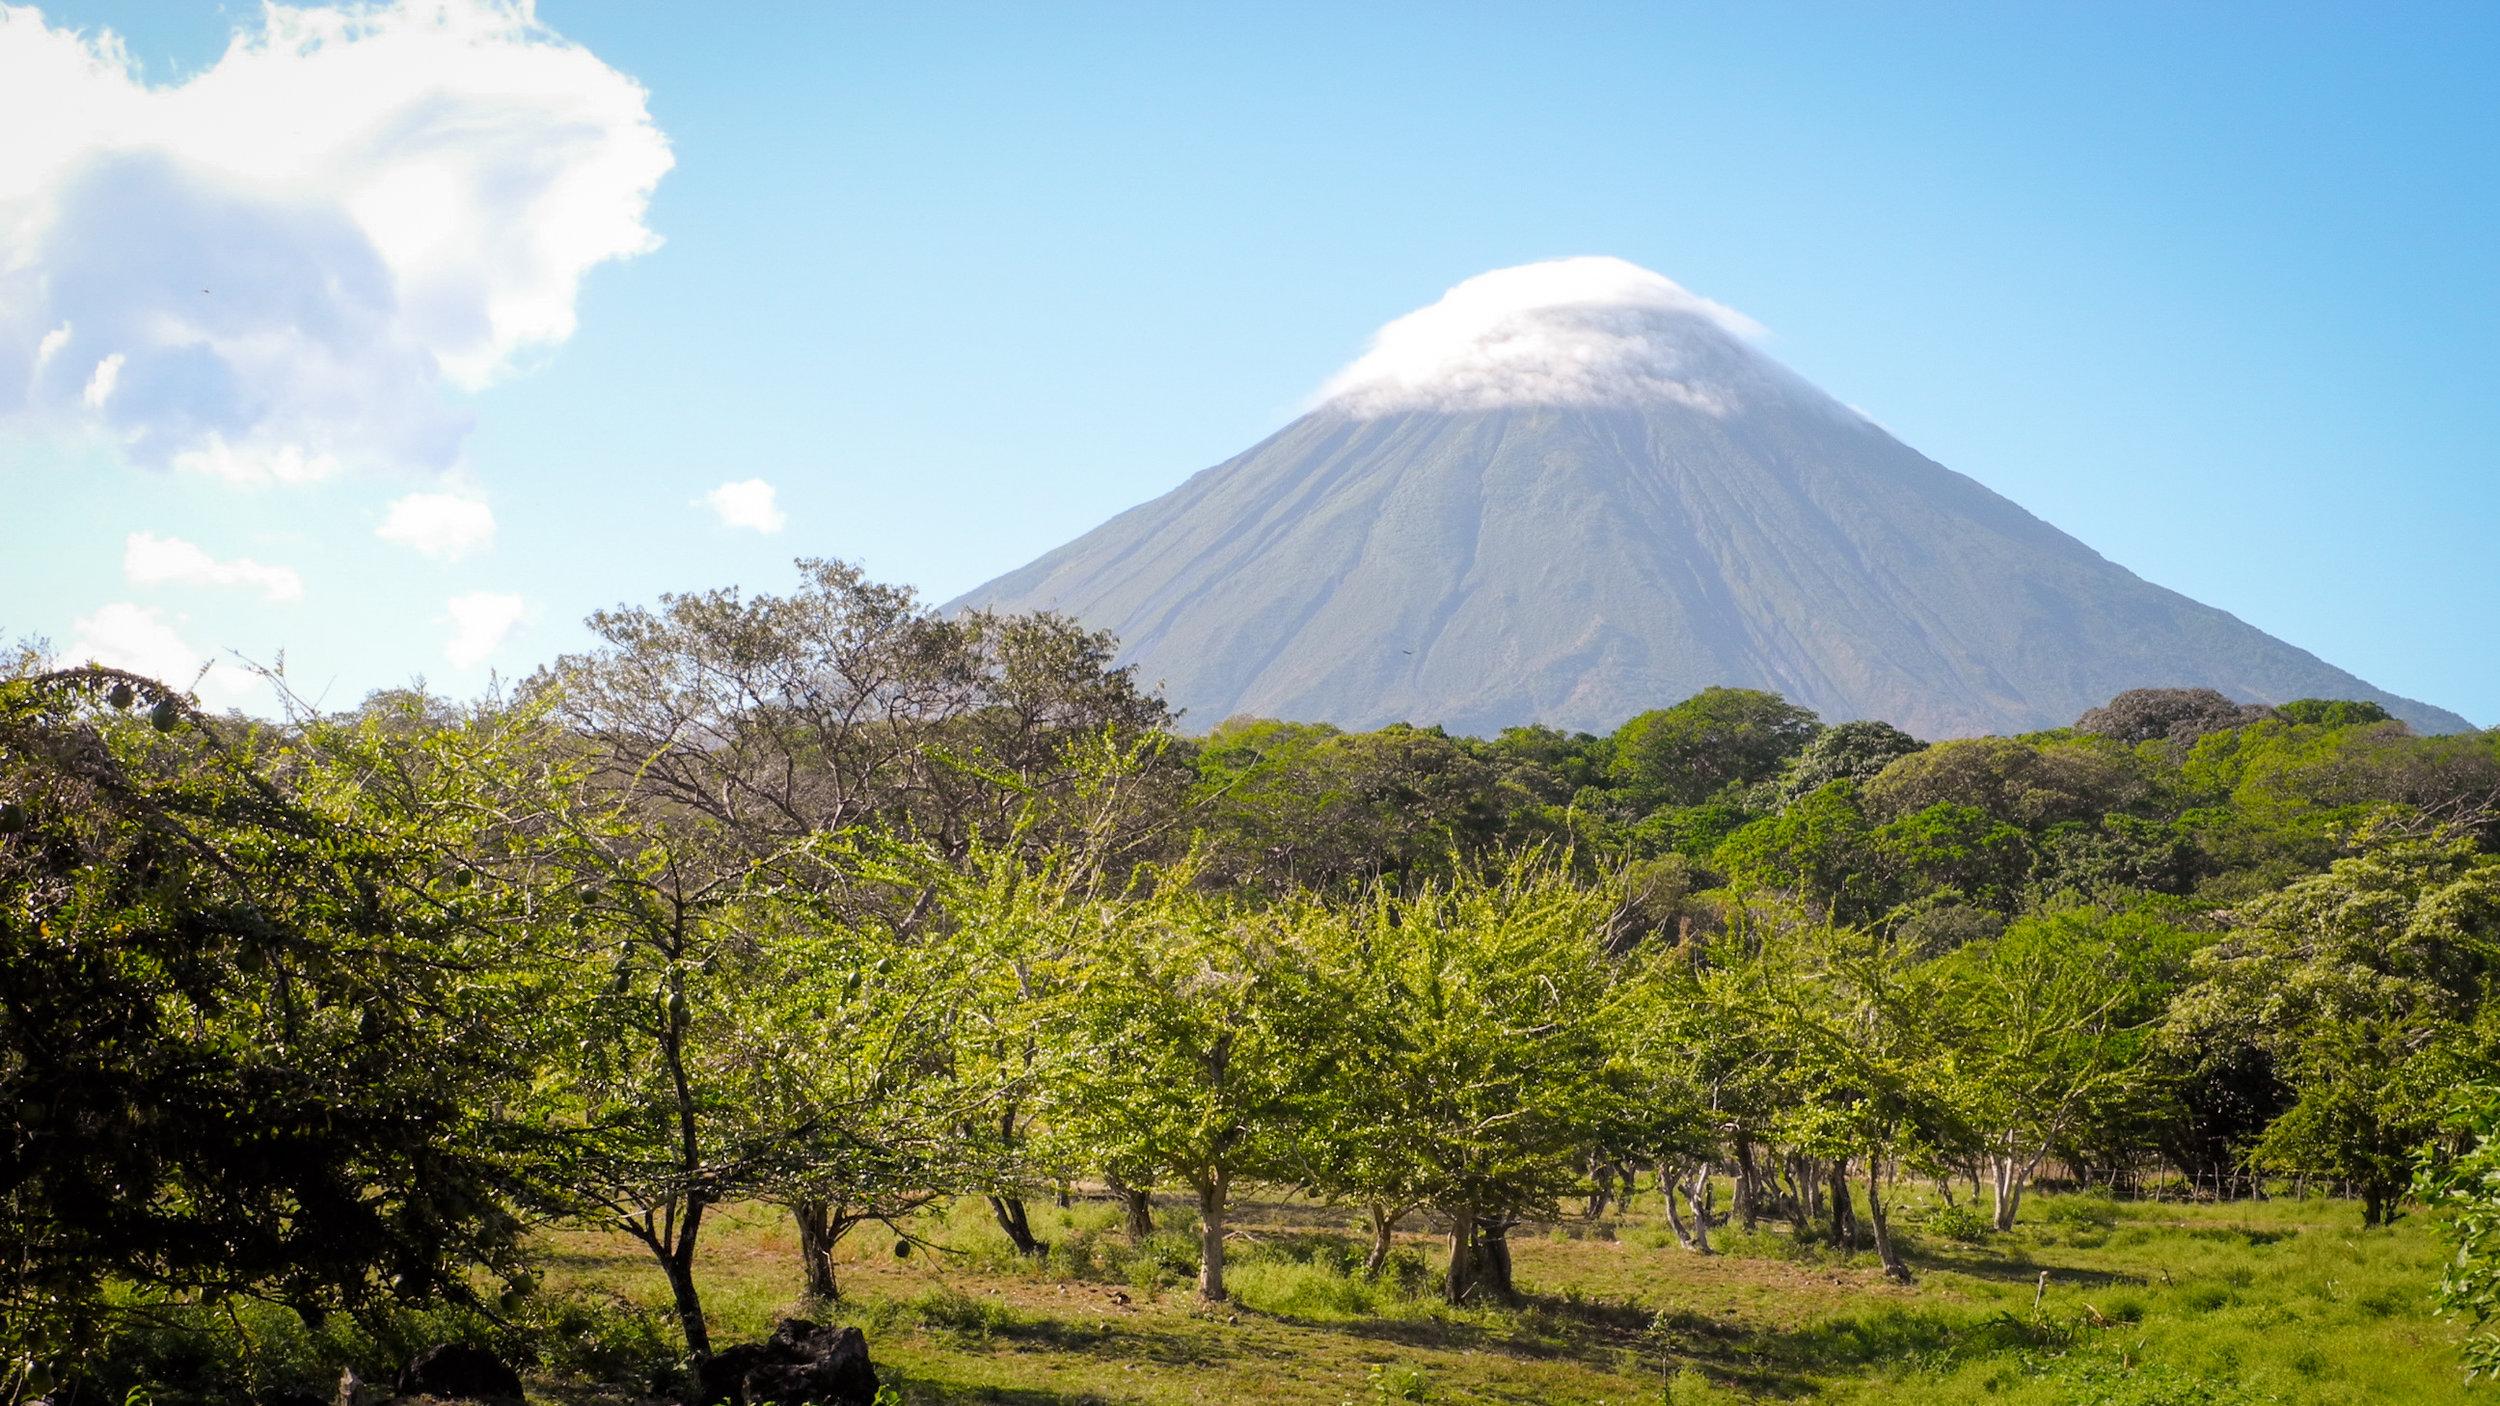 Concepcion_volcano_in_Nicaragua_2012.jpg